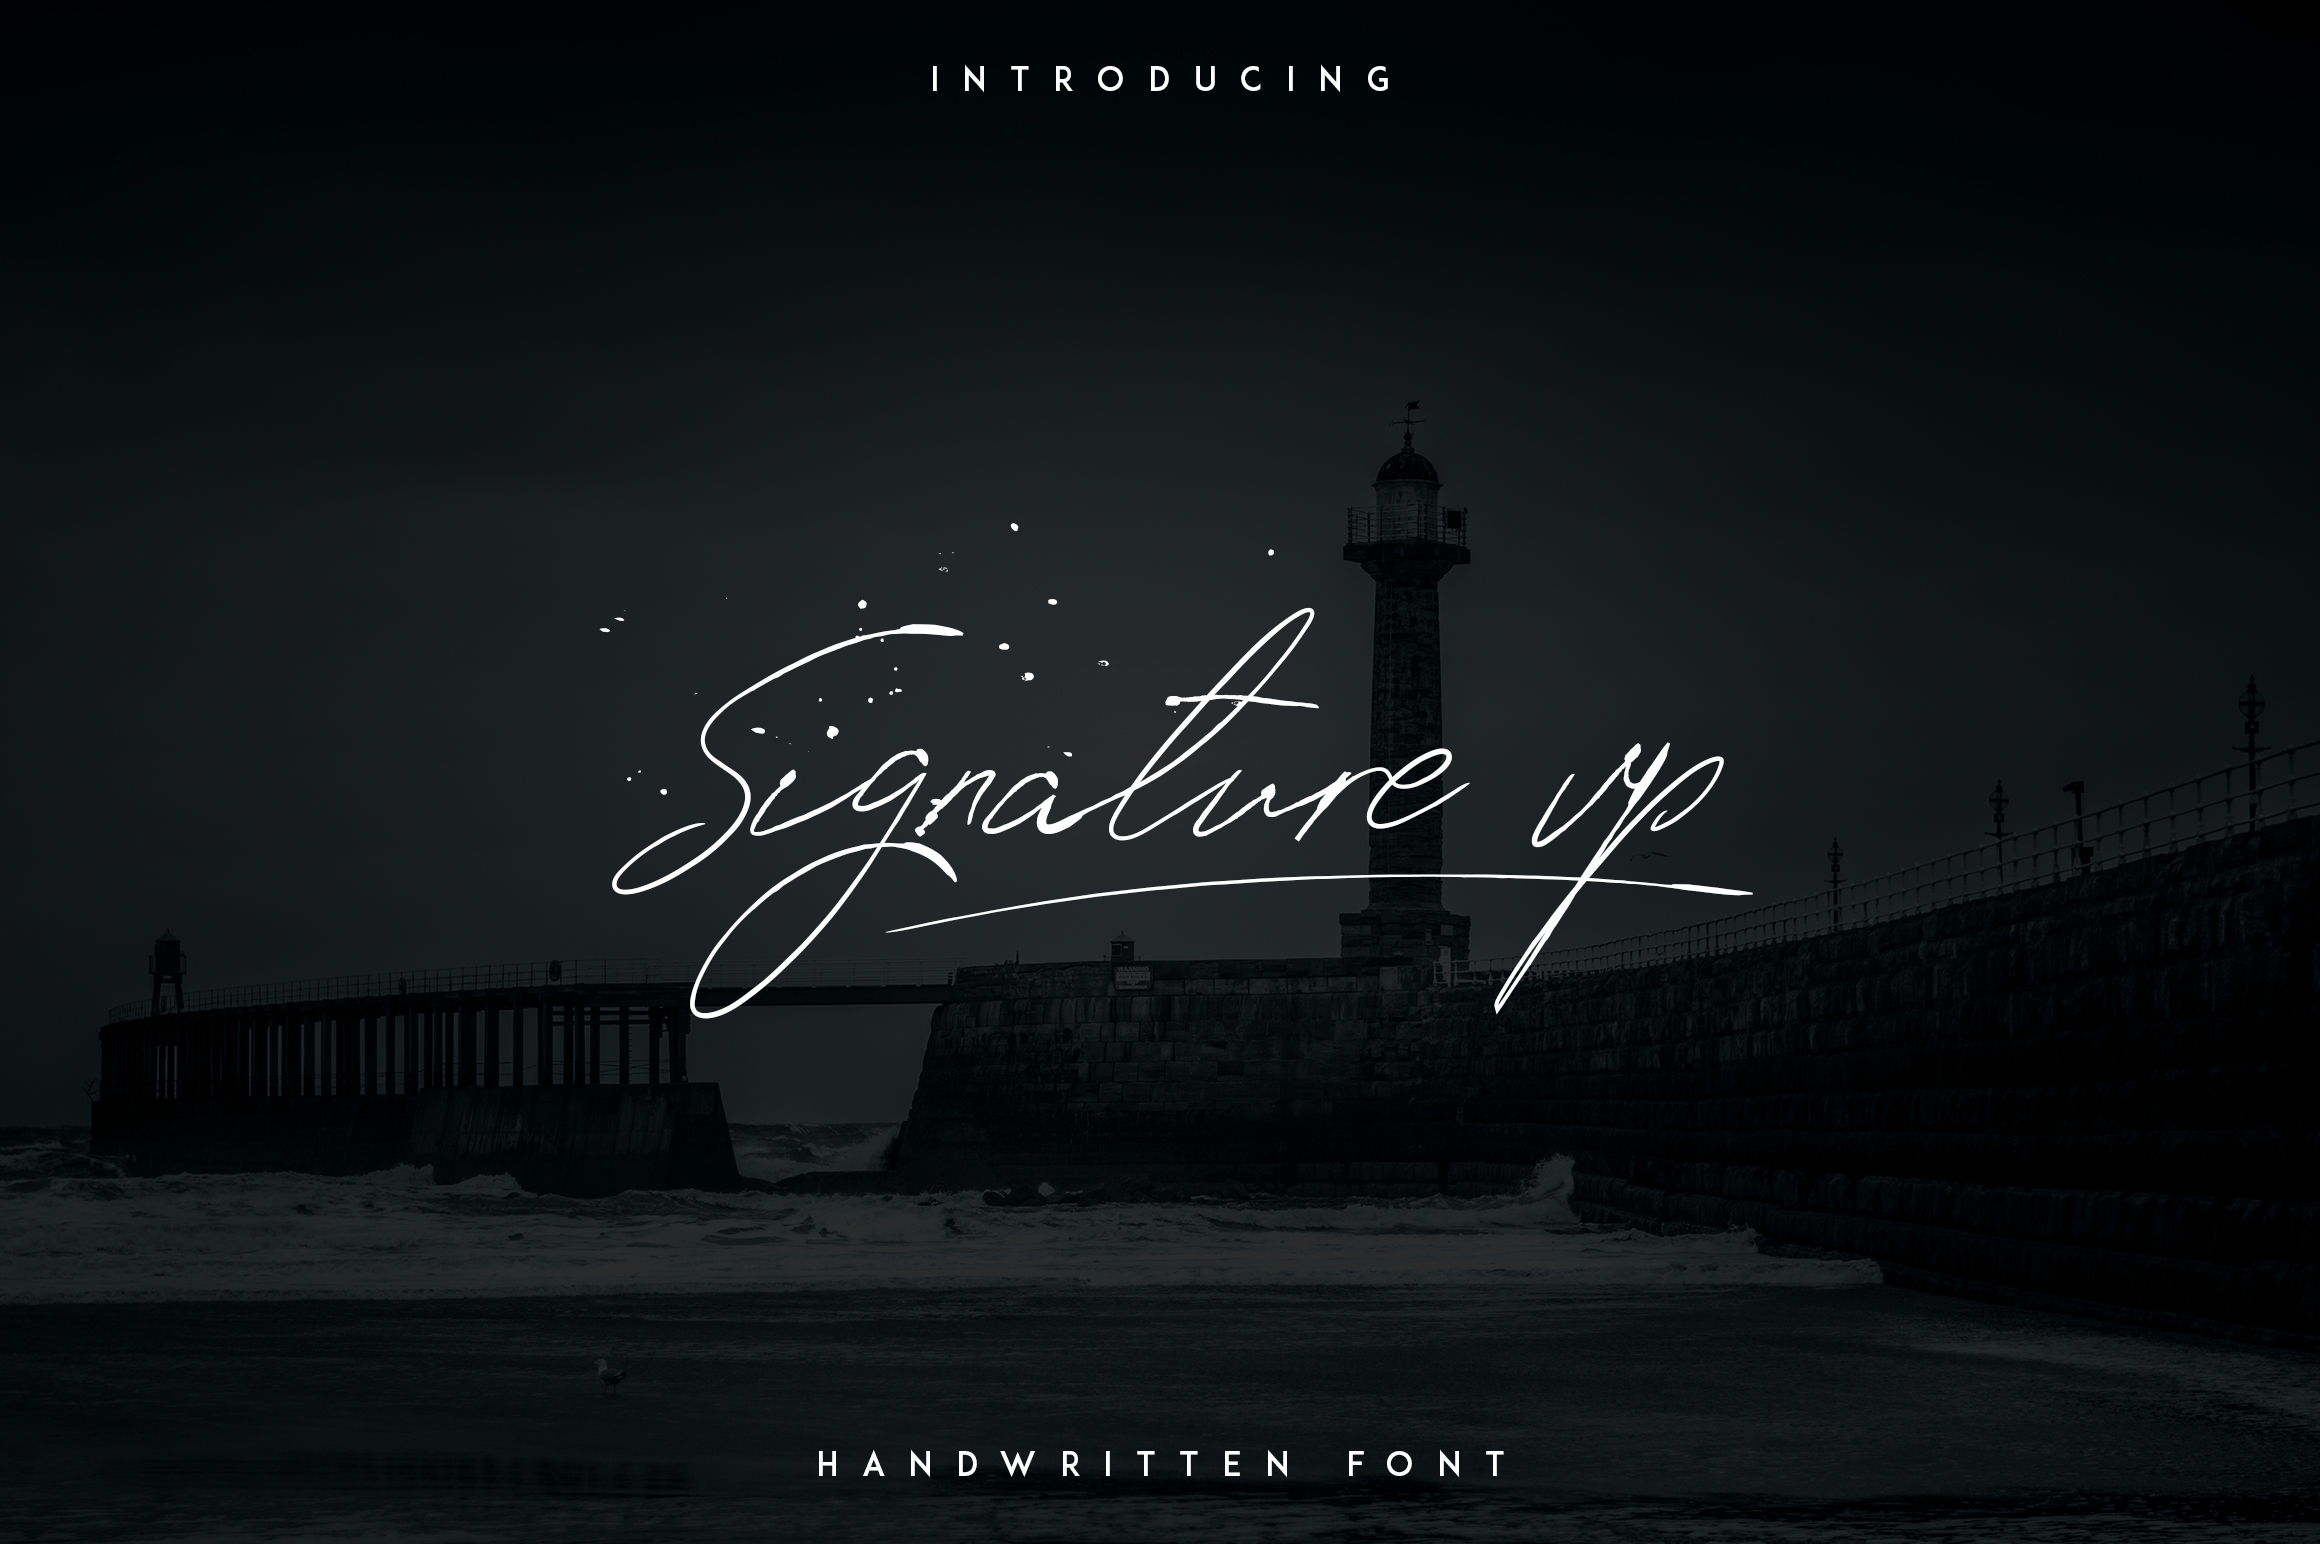 Signature vp - Handwritten font example image 1